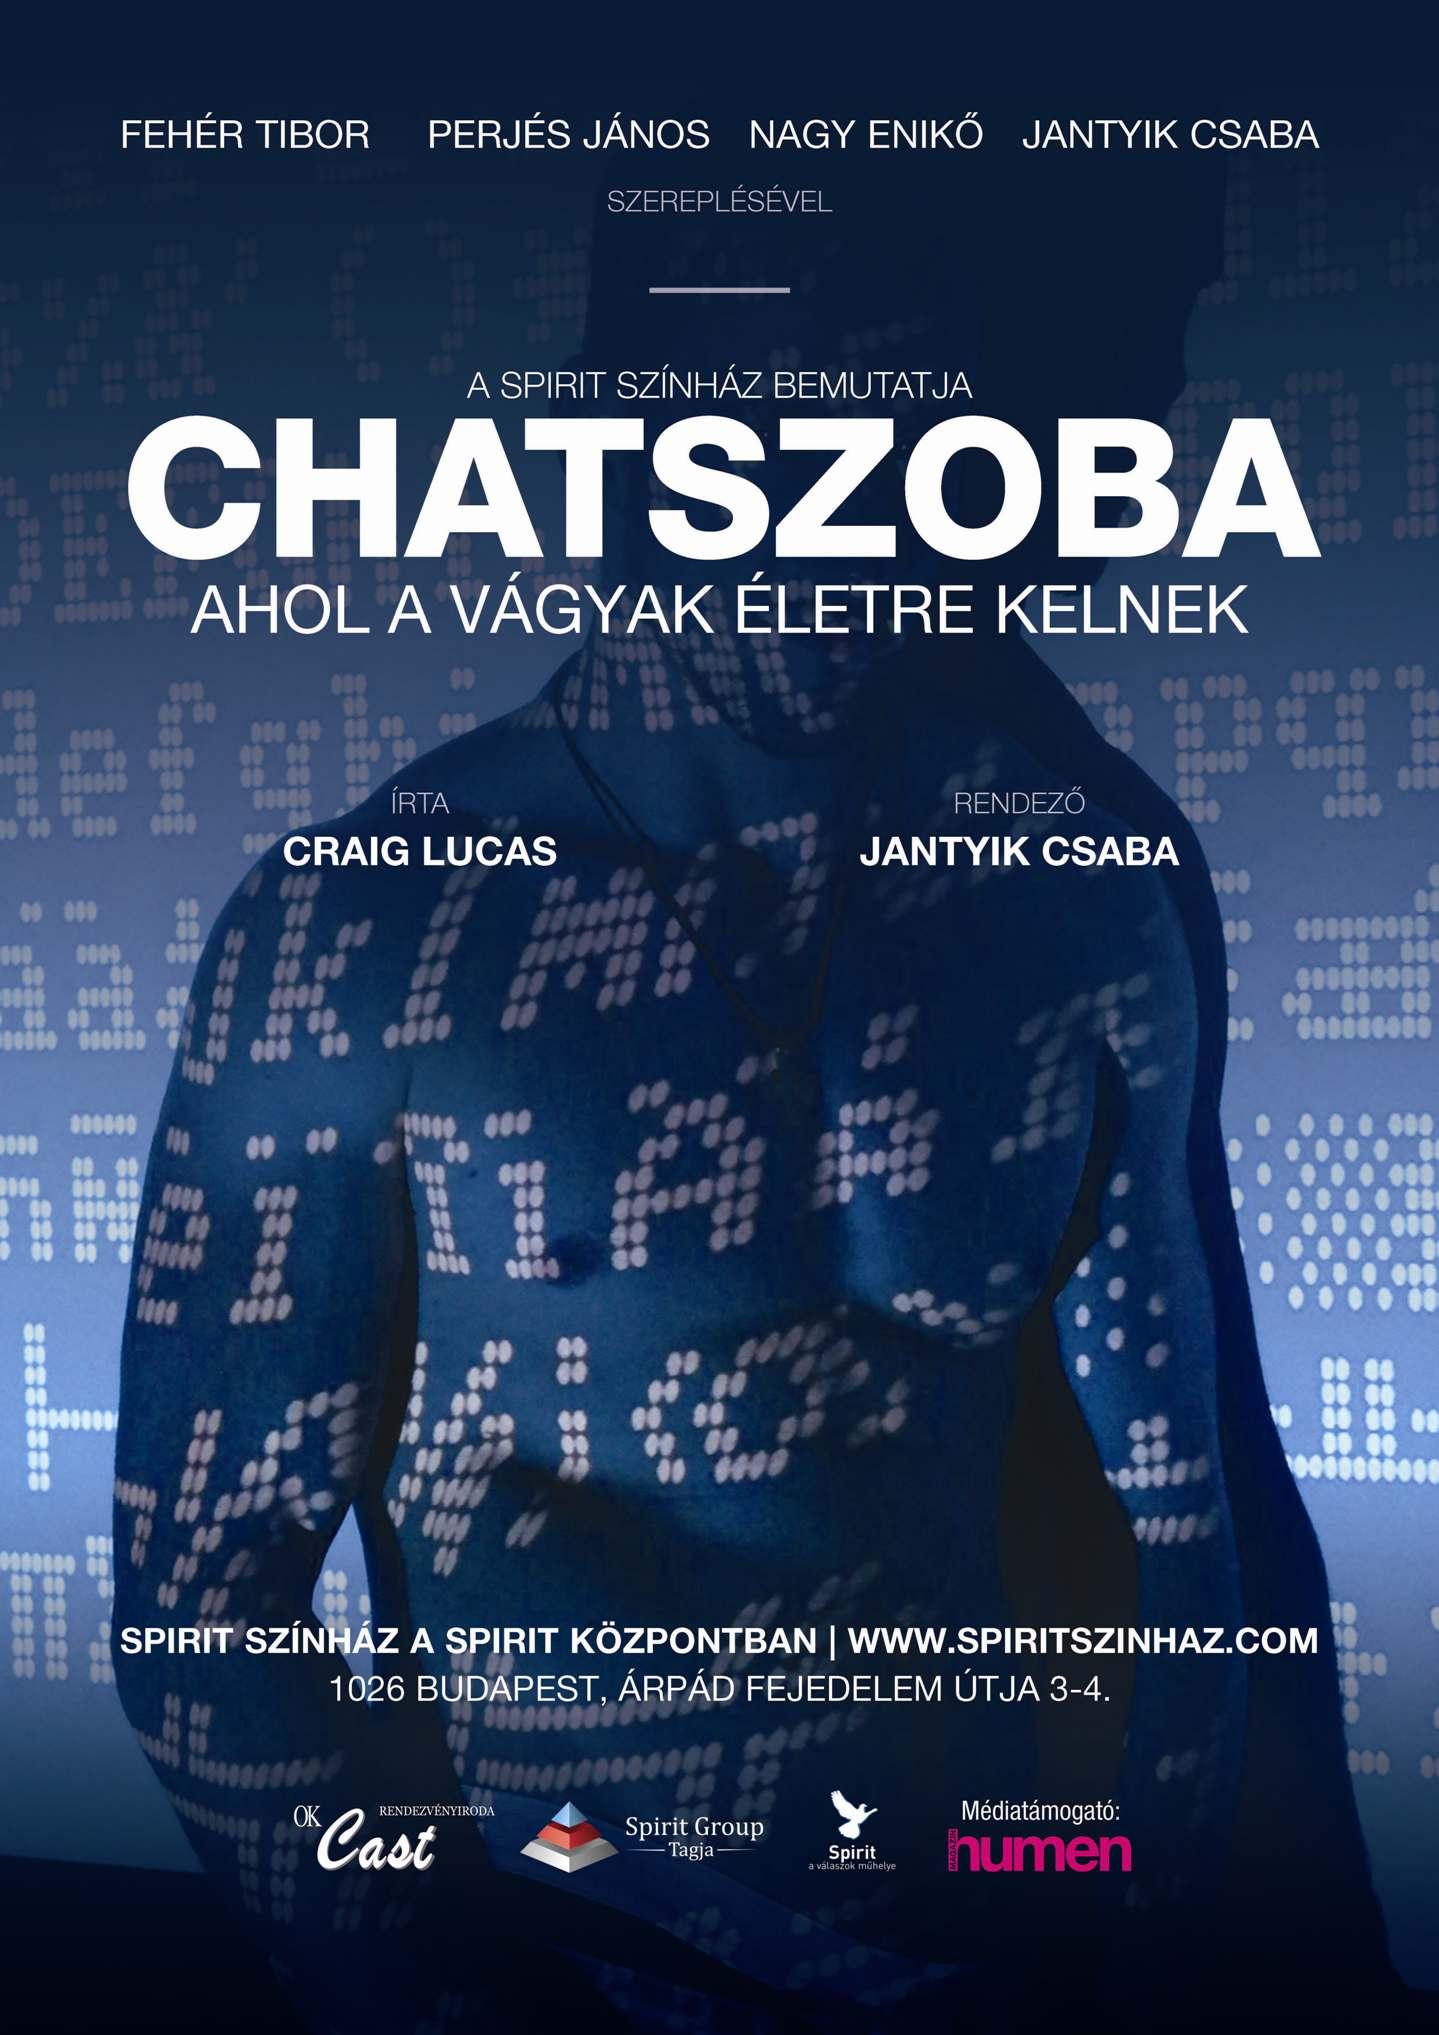 Chatszoba - A Te szemeddel